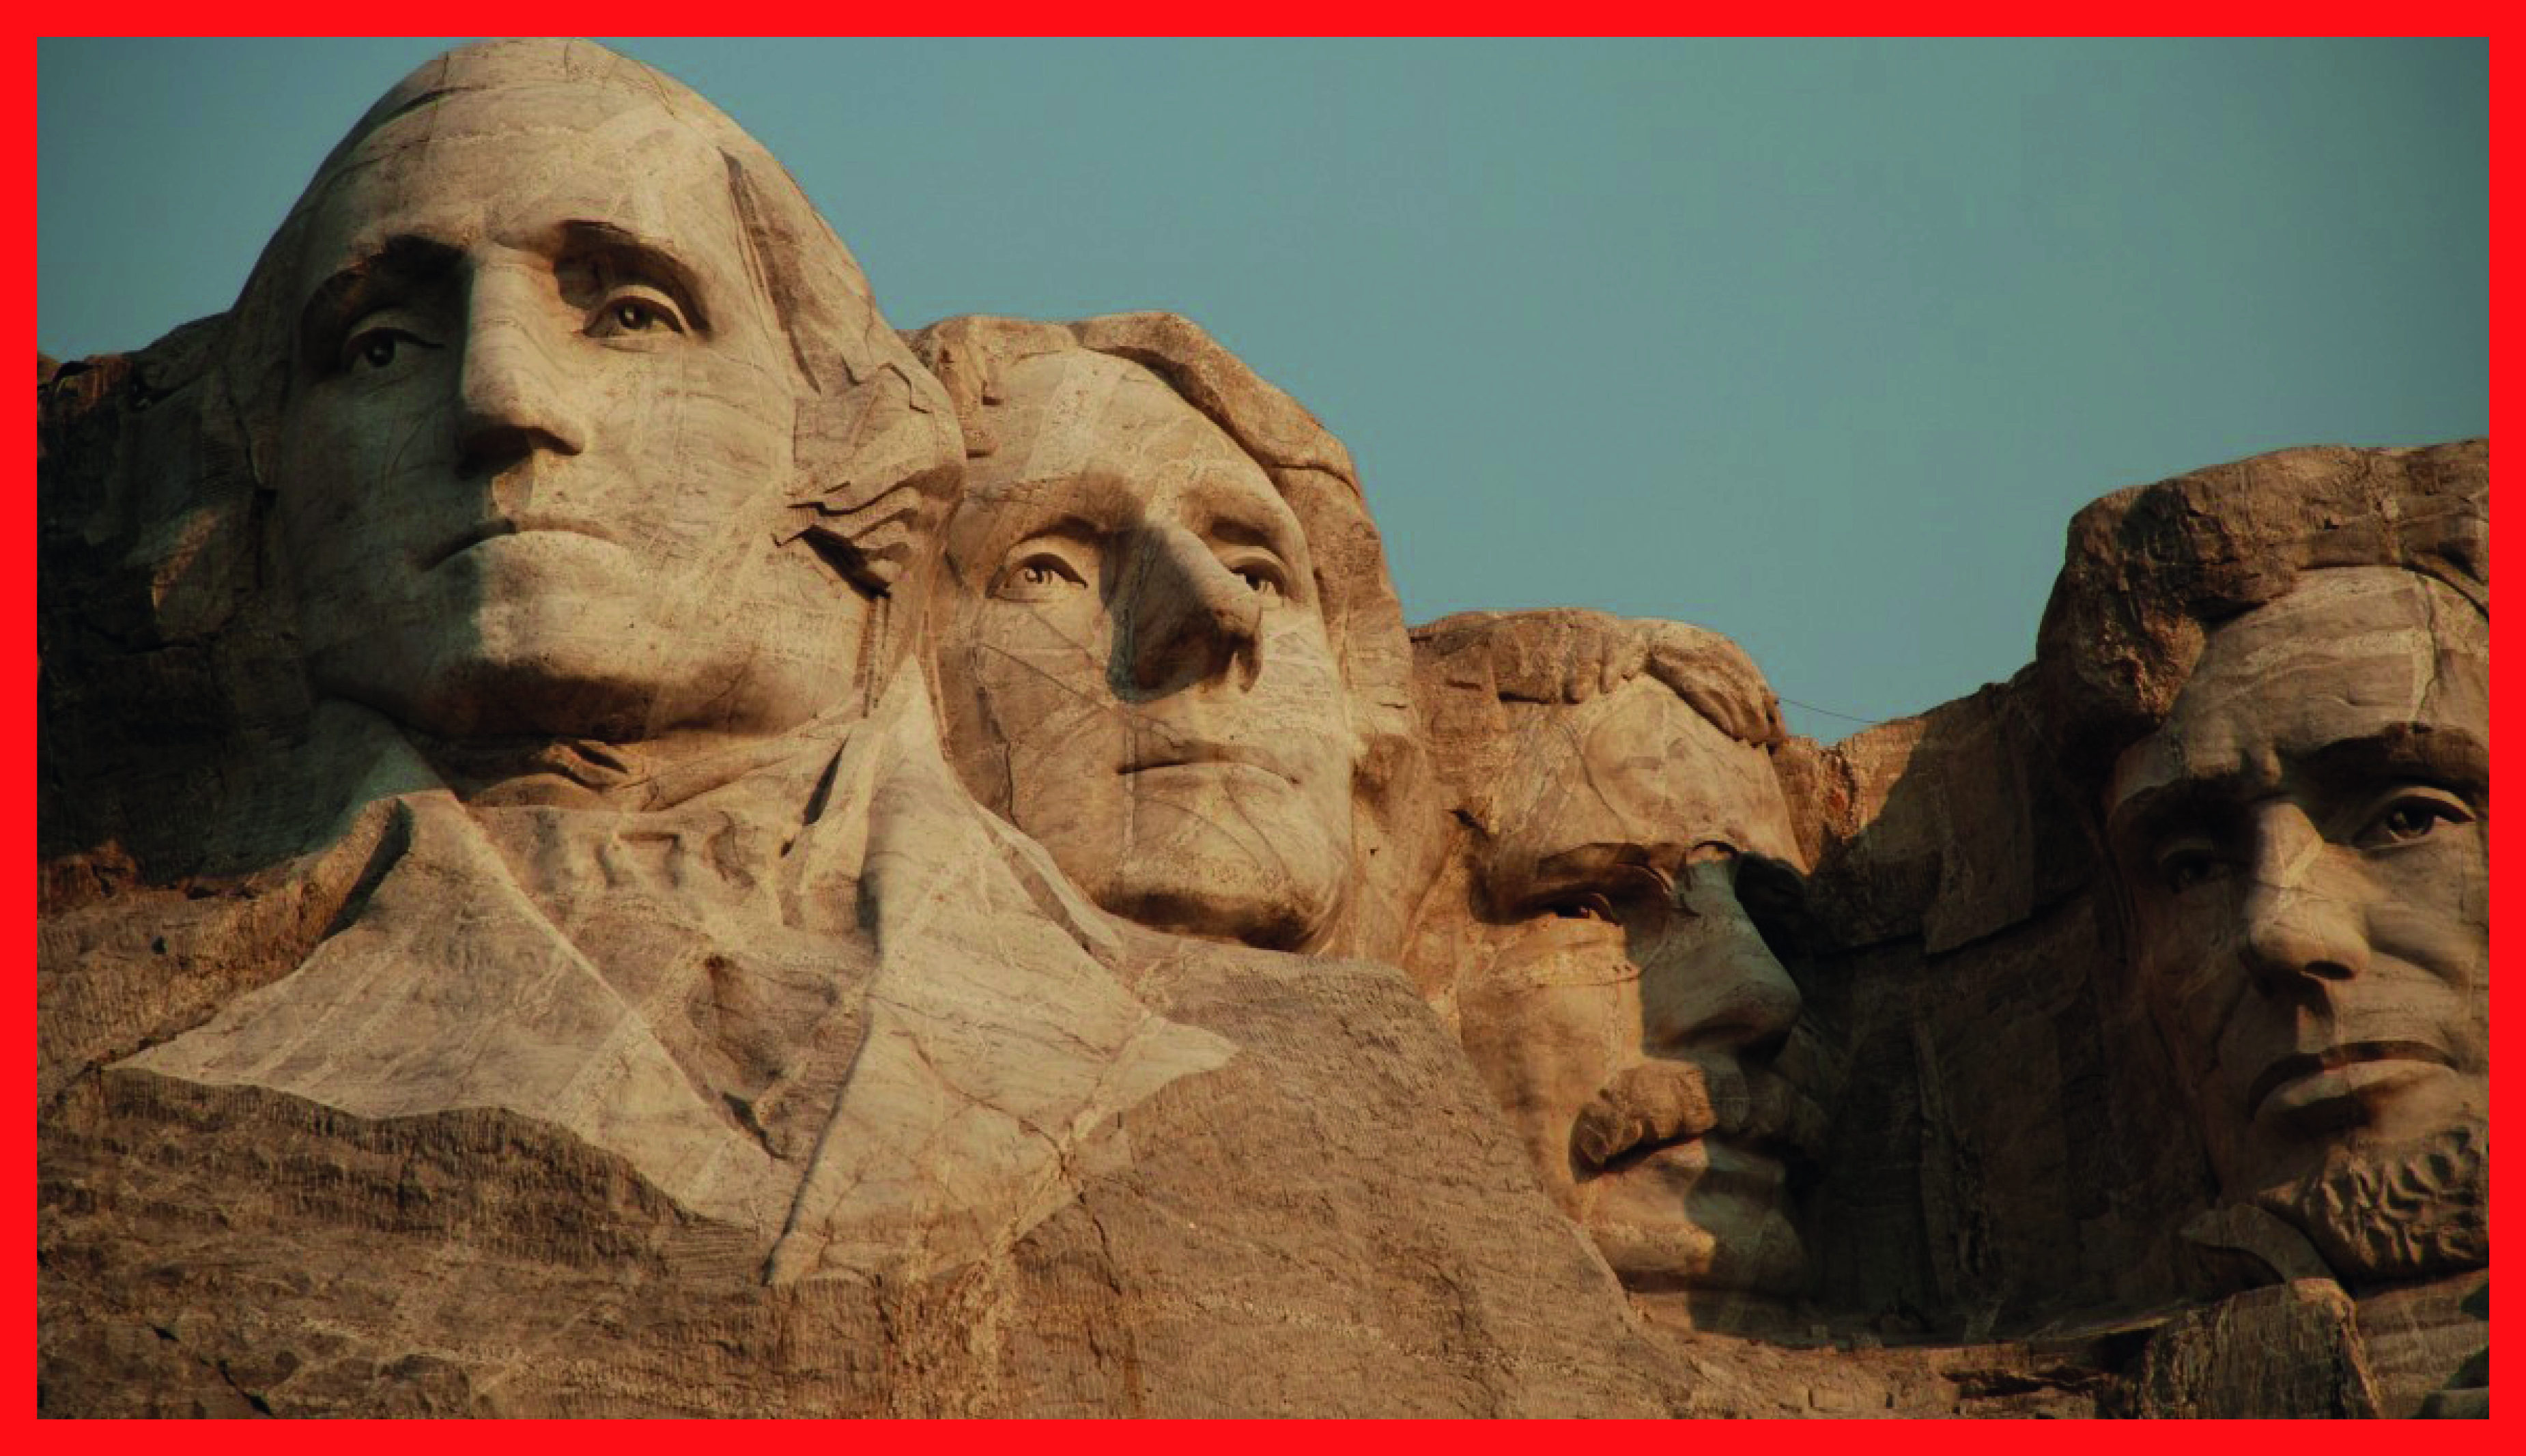 Mardi 15 Octobre ★ Les Monuments Emblématiques Américains